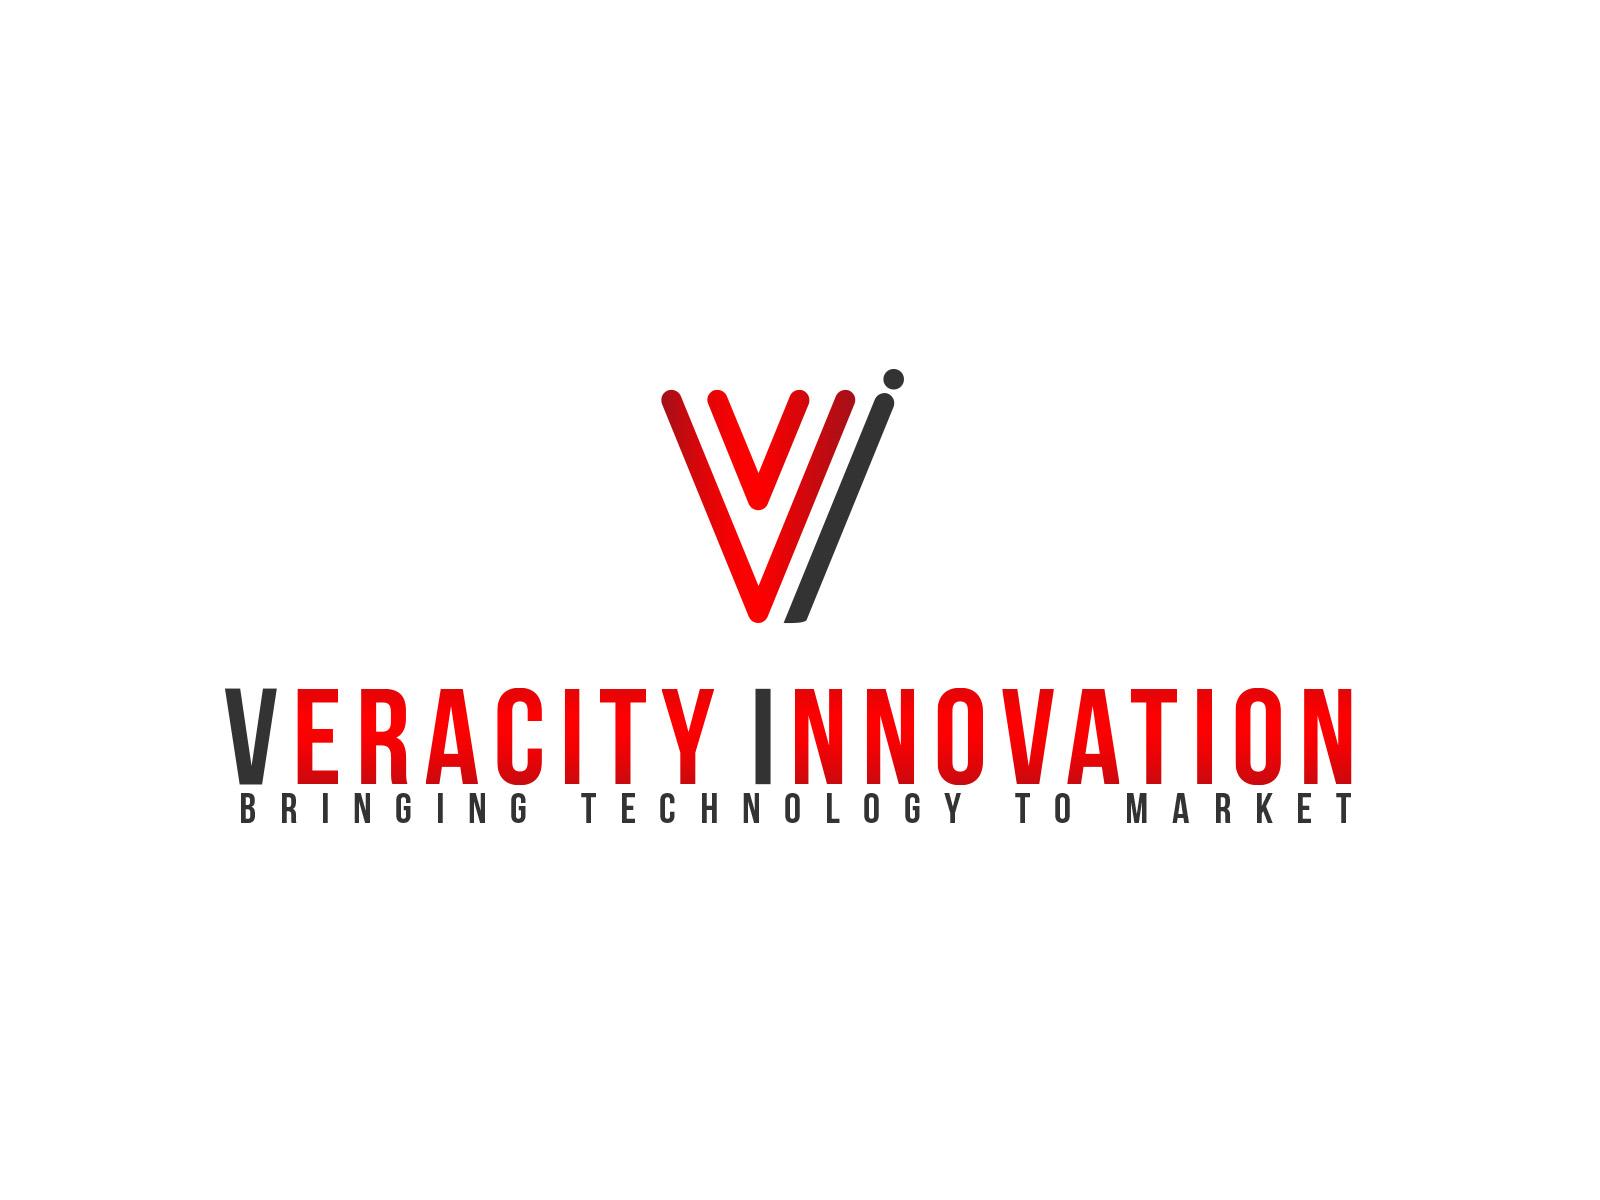 Logo Design by olii - Entry No. 305 in the Logo Design Contest Creative Logo Design for Veracity Innovation, LLC.